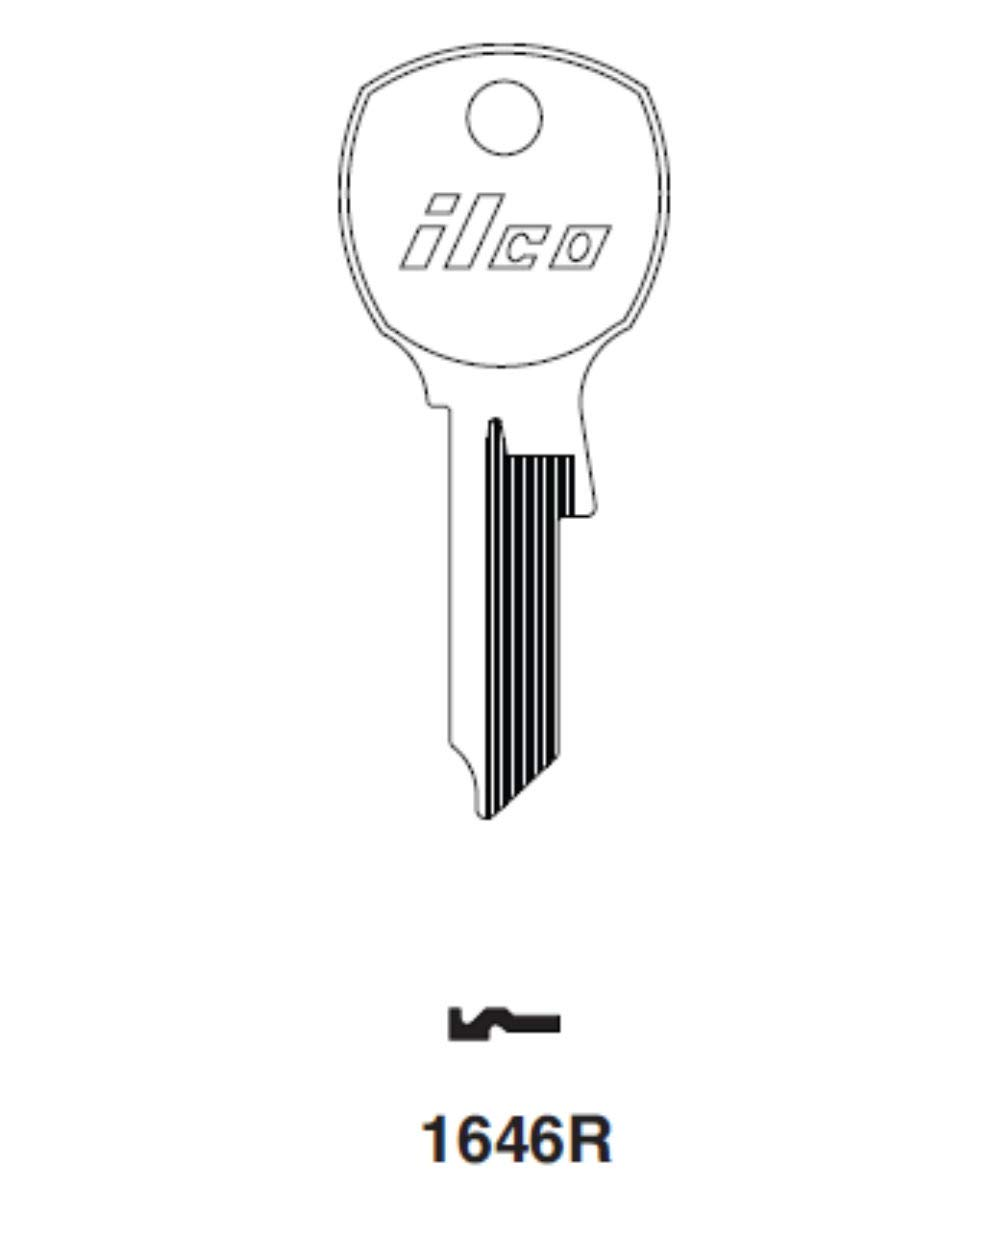 Key Blank For Usps Mailbox Locks (1646R) by Kaba Ilco (Image #2)